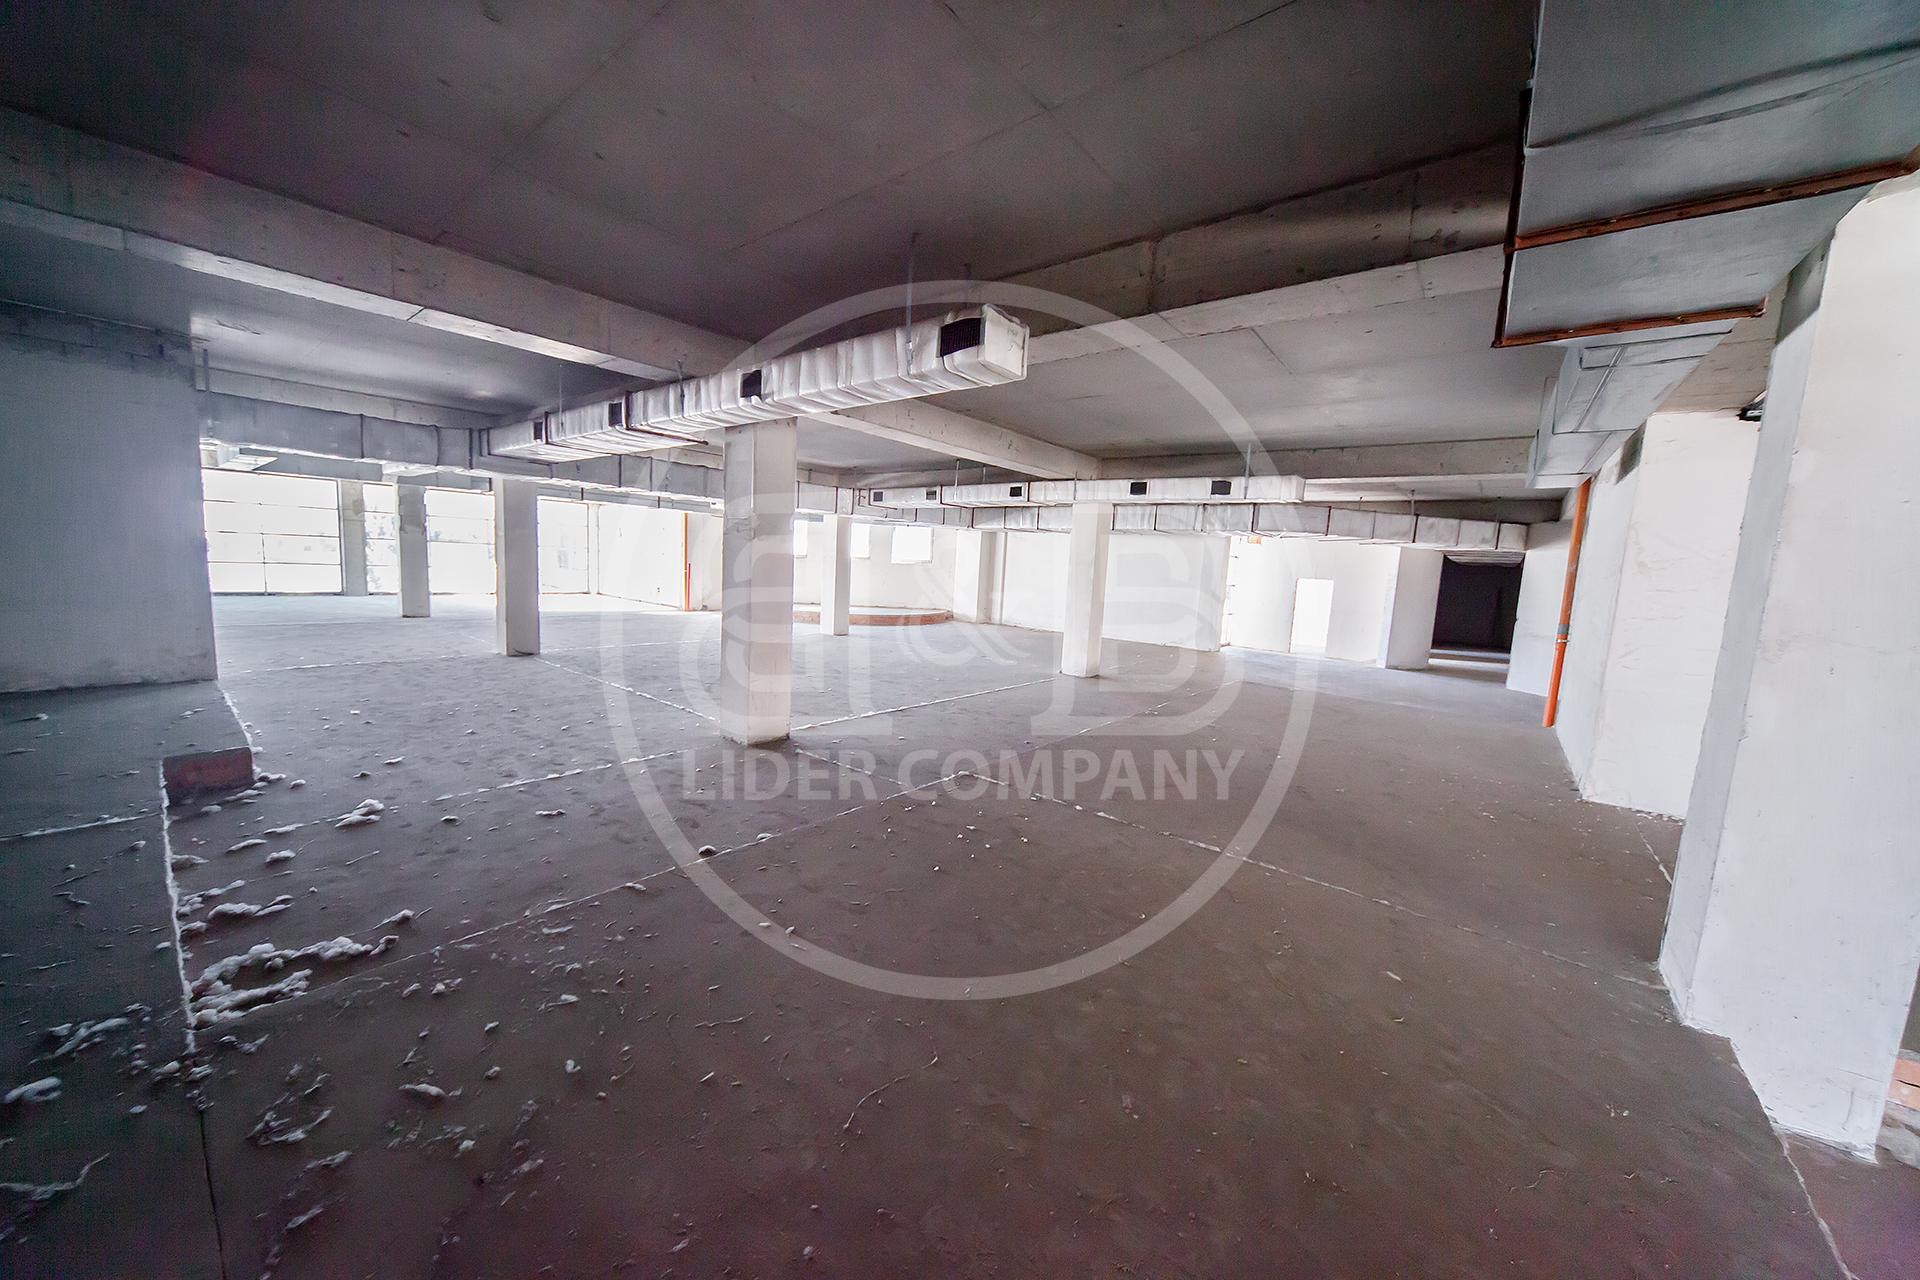 Spatiu comercial 700 m2 Prima linie variantă sură , Botanica str. Decebal 549 euro/m2